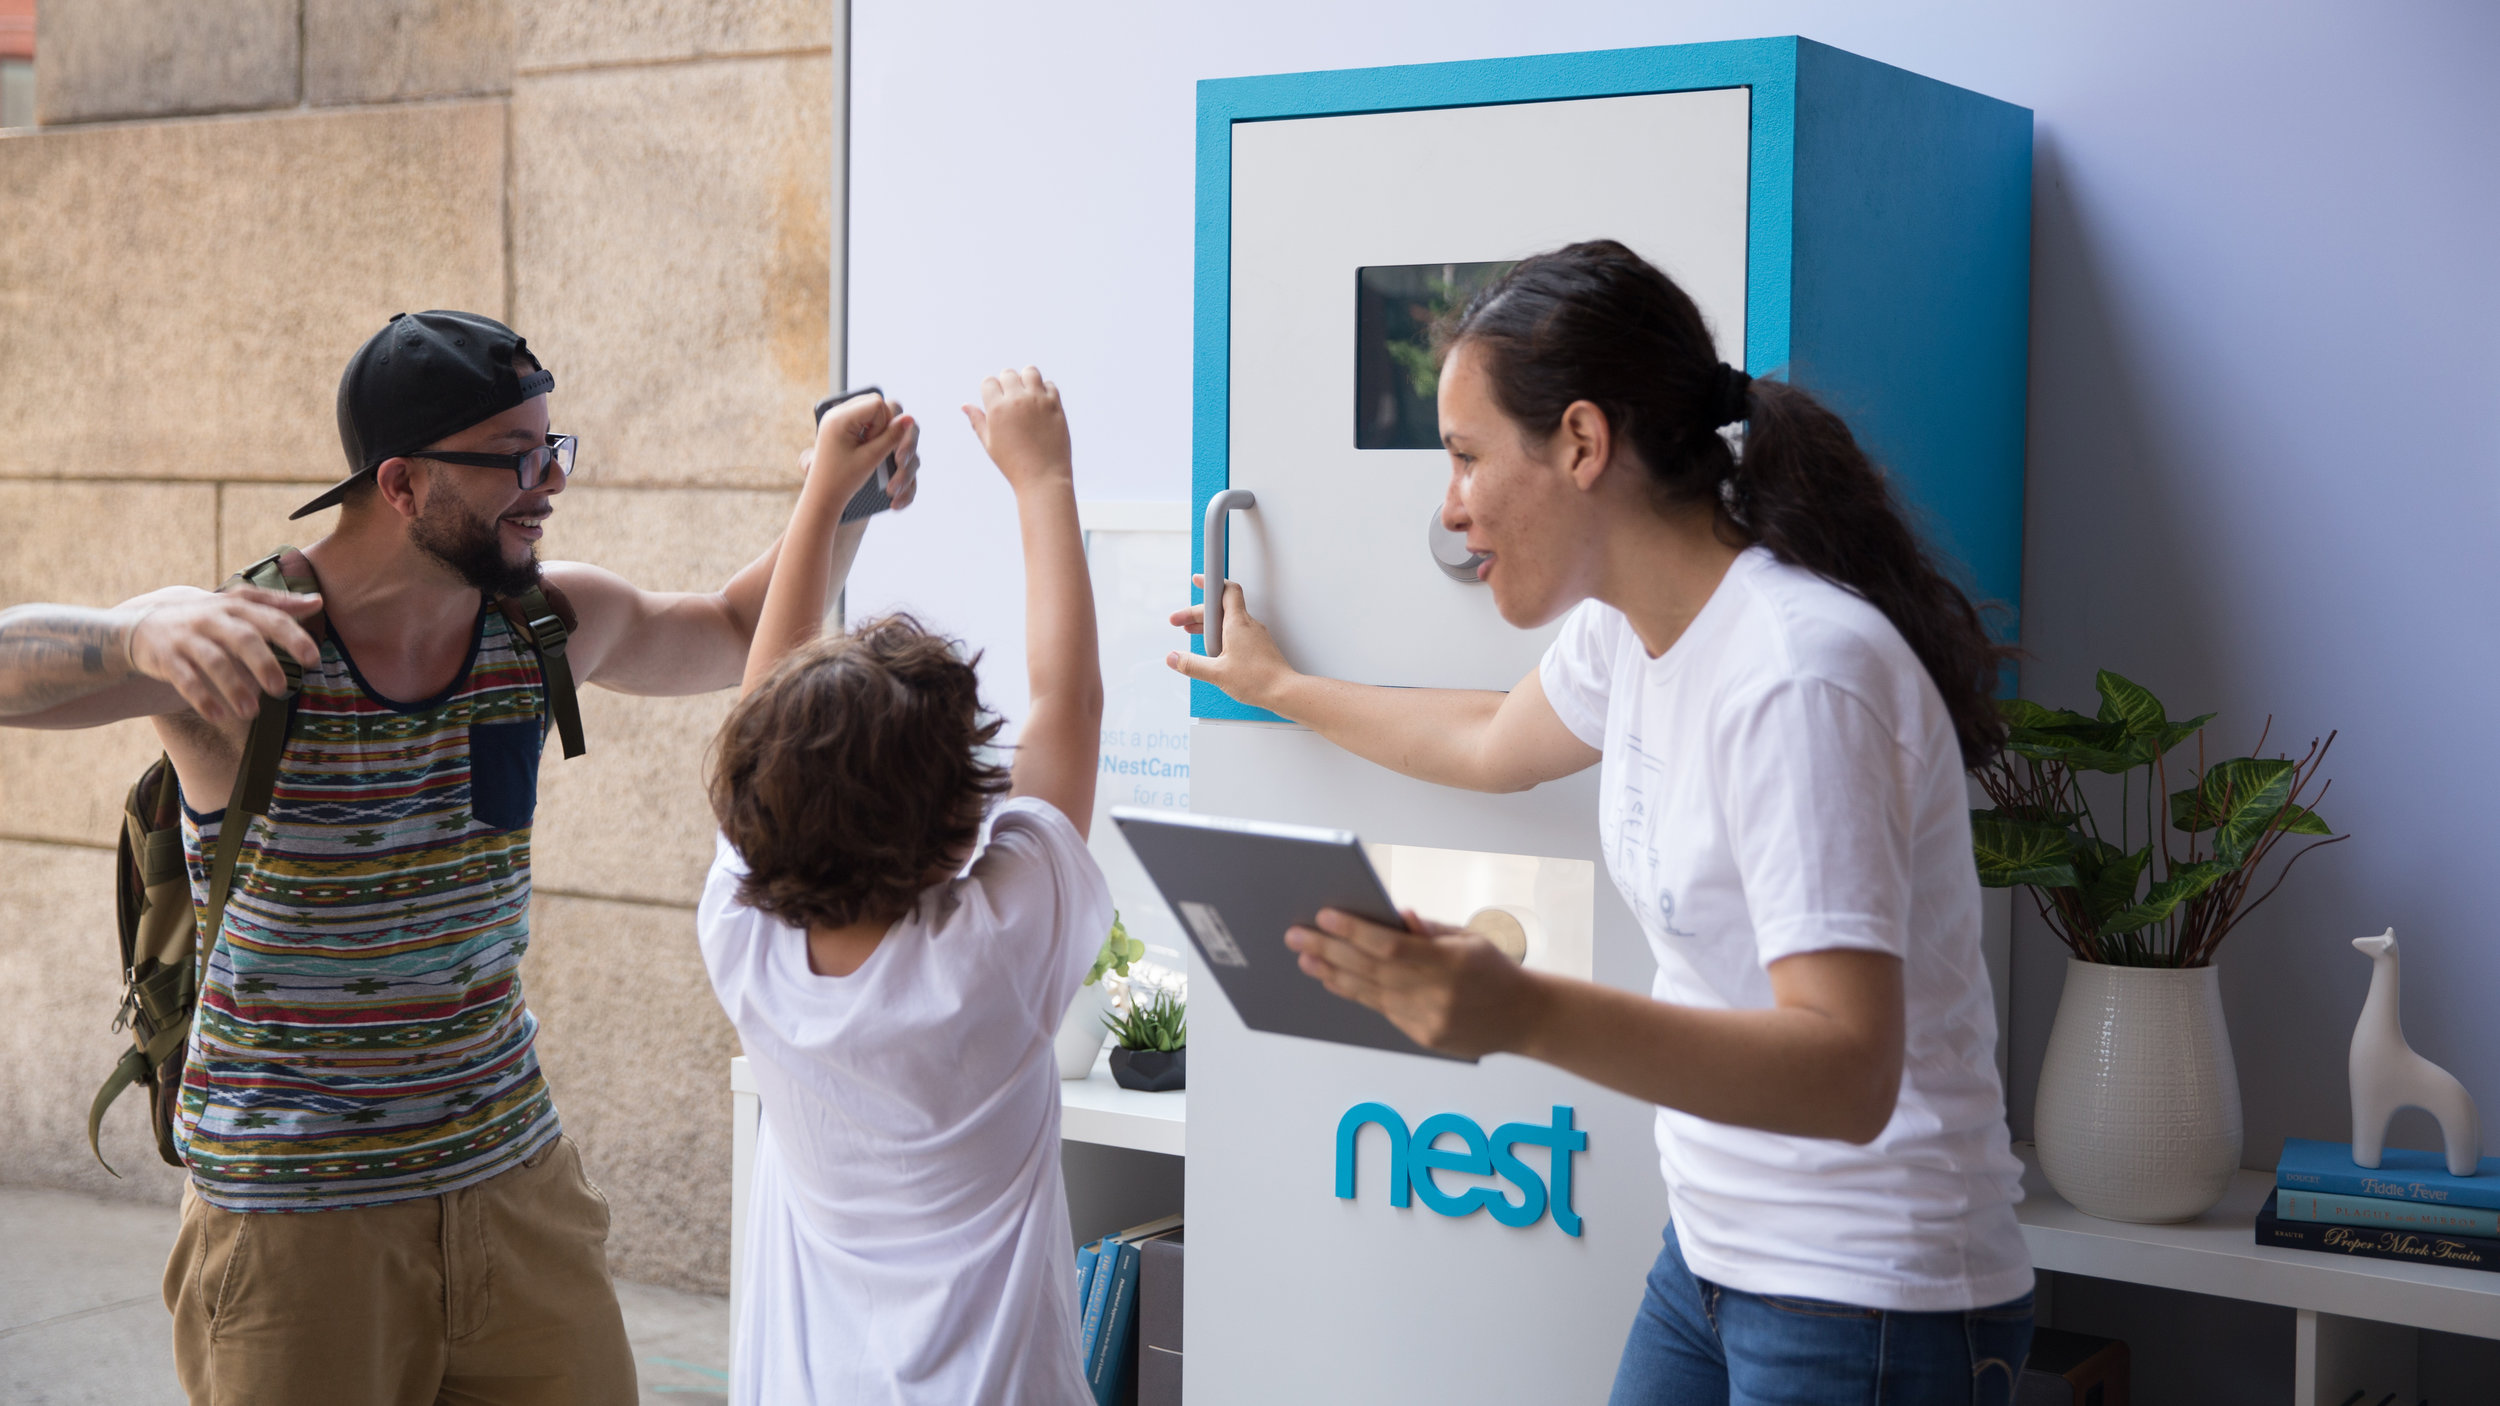 nest_heist2.jpg